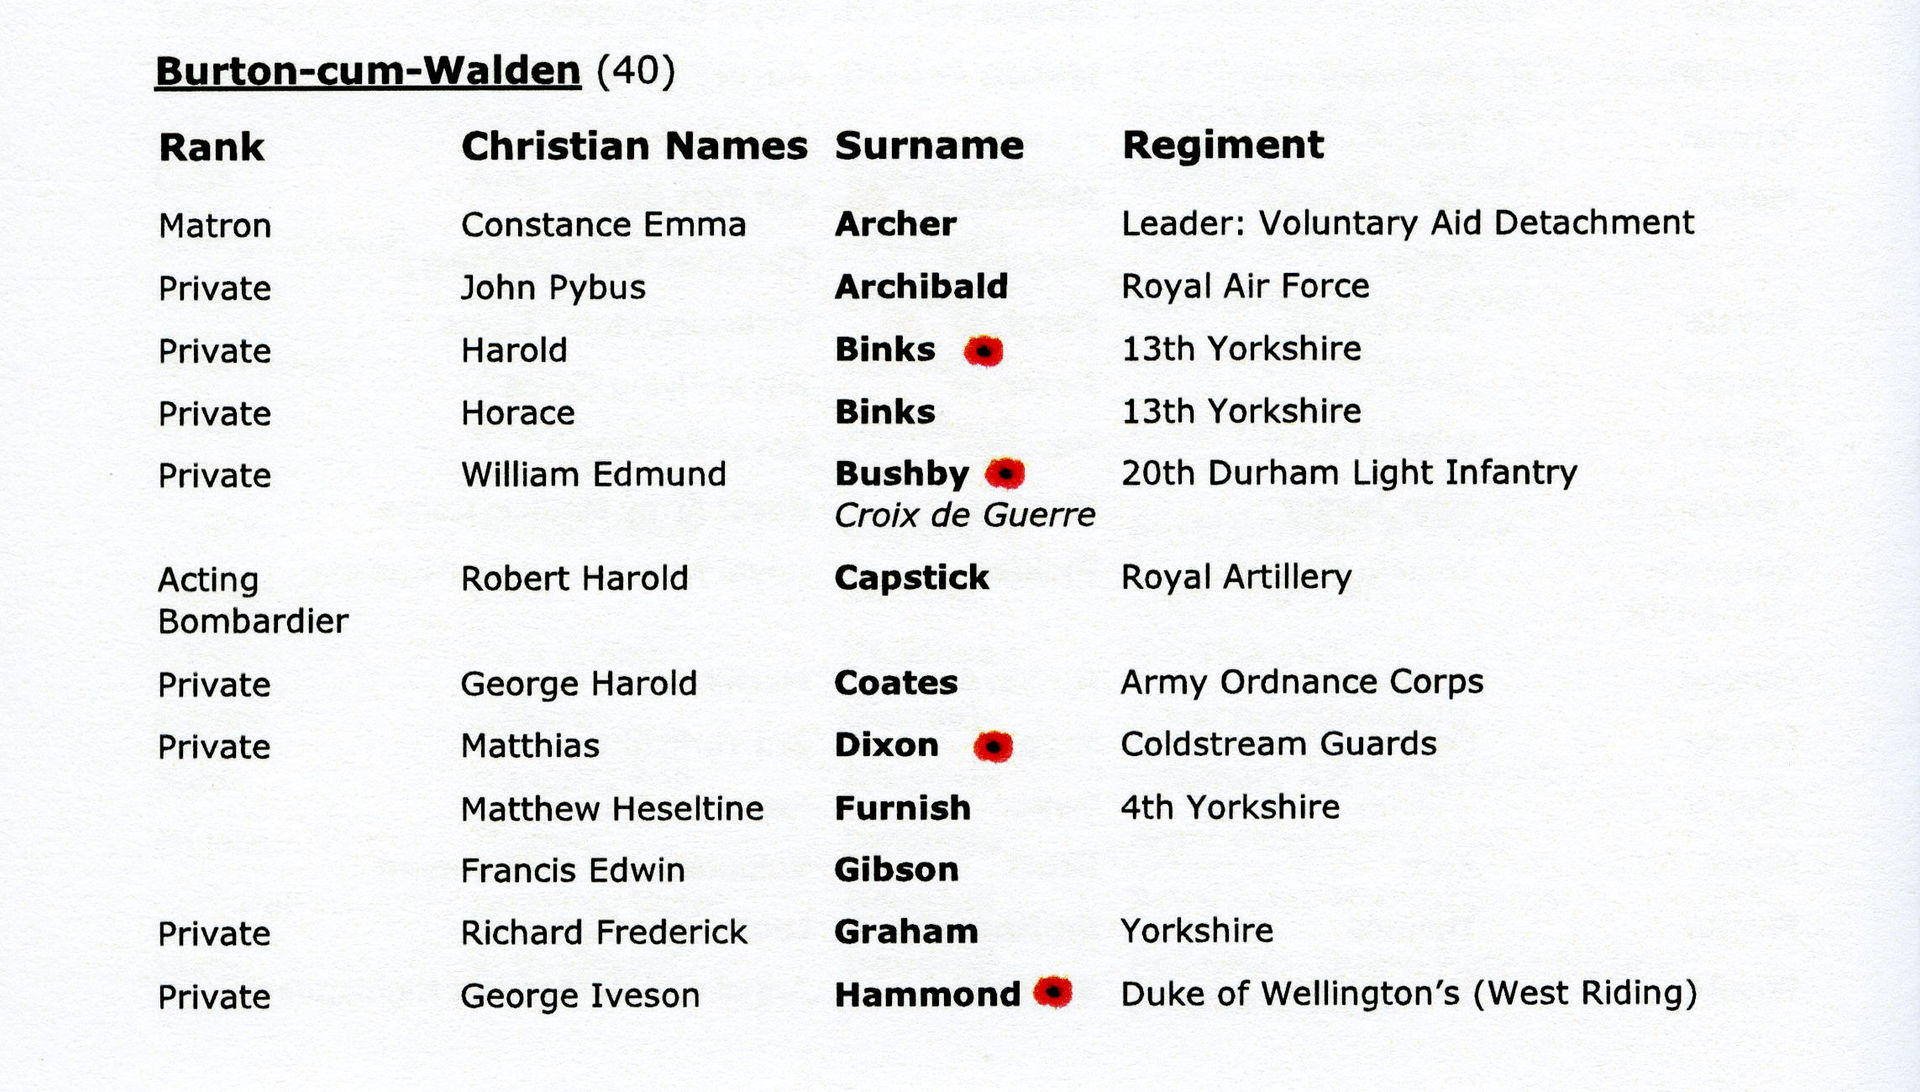 Burton-cum-Walden Names 1 RoH